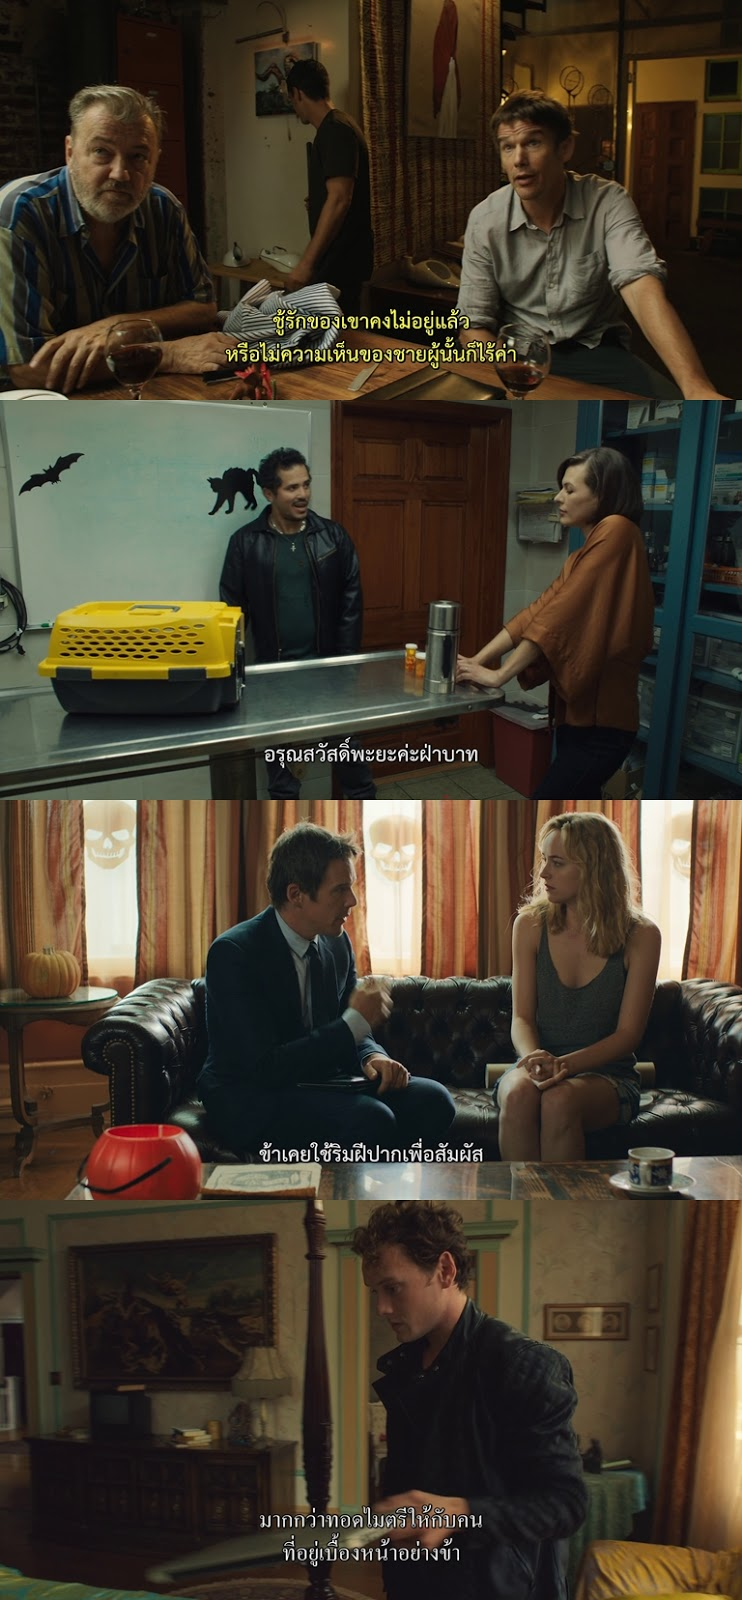 [MINI-HD] CYMBELINE (2014) ซิมเบลลีน ศึกแค้นสงครามนักบิด [1080P HQ] [เสียงไทยมาสเตอร์ 5.1 + ENG DTS] [บรรยายไทย + อังกฤษ] Zakky-cym